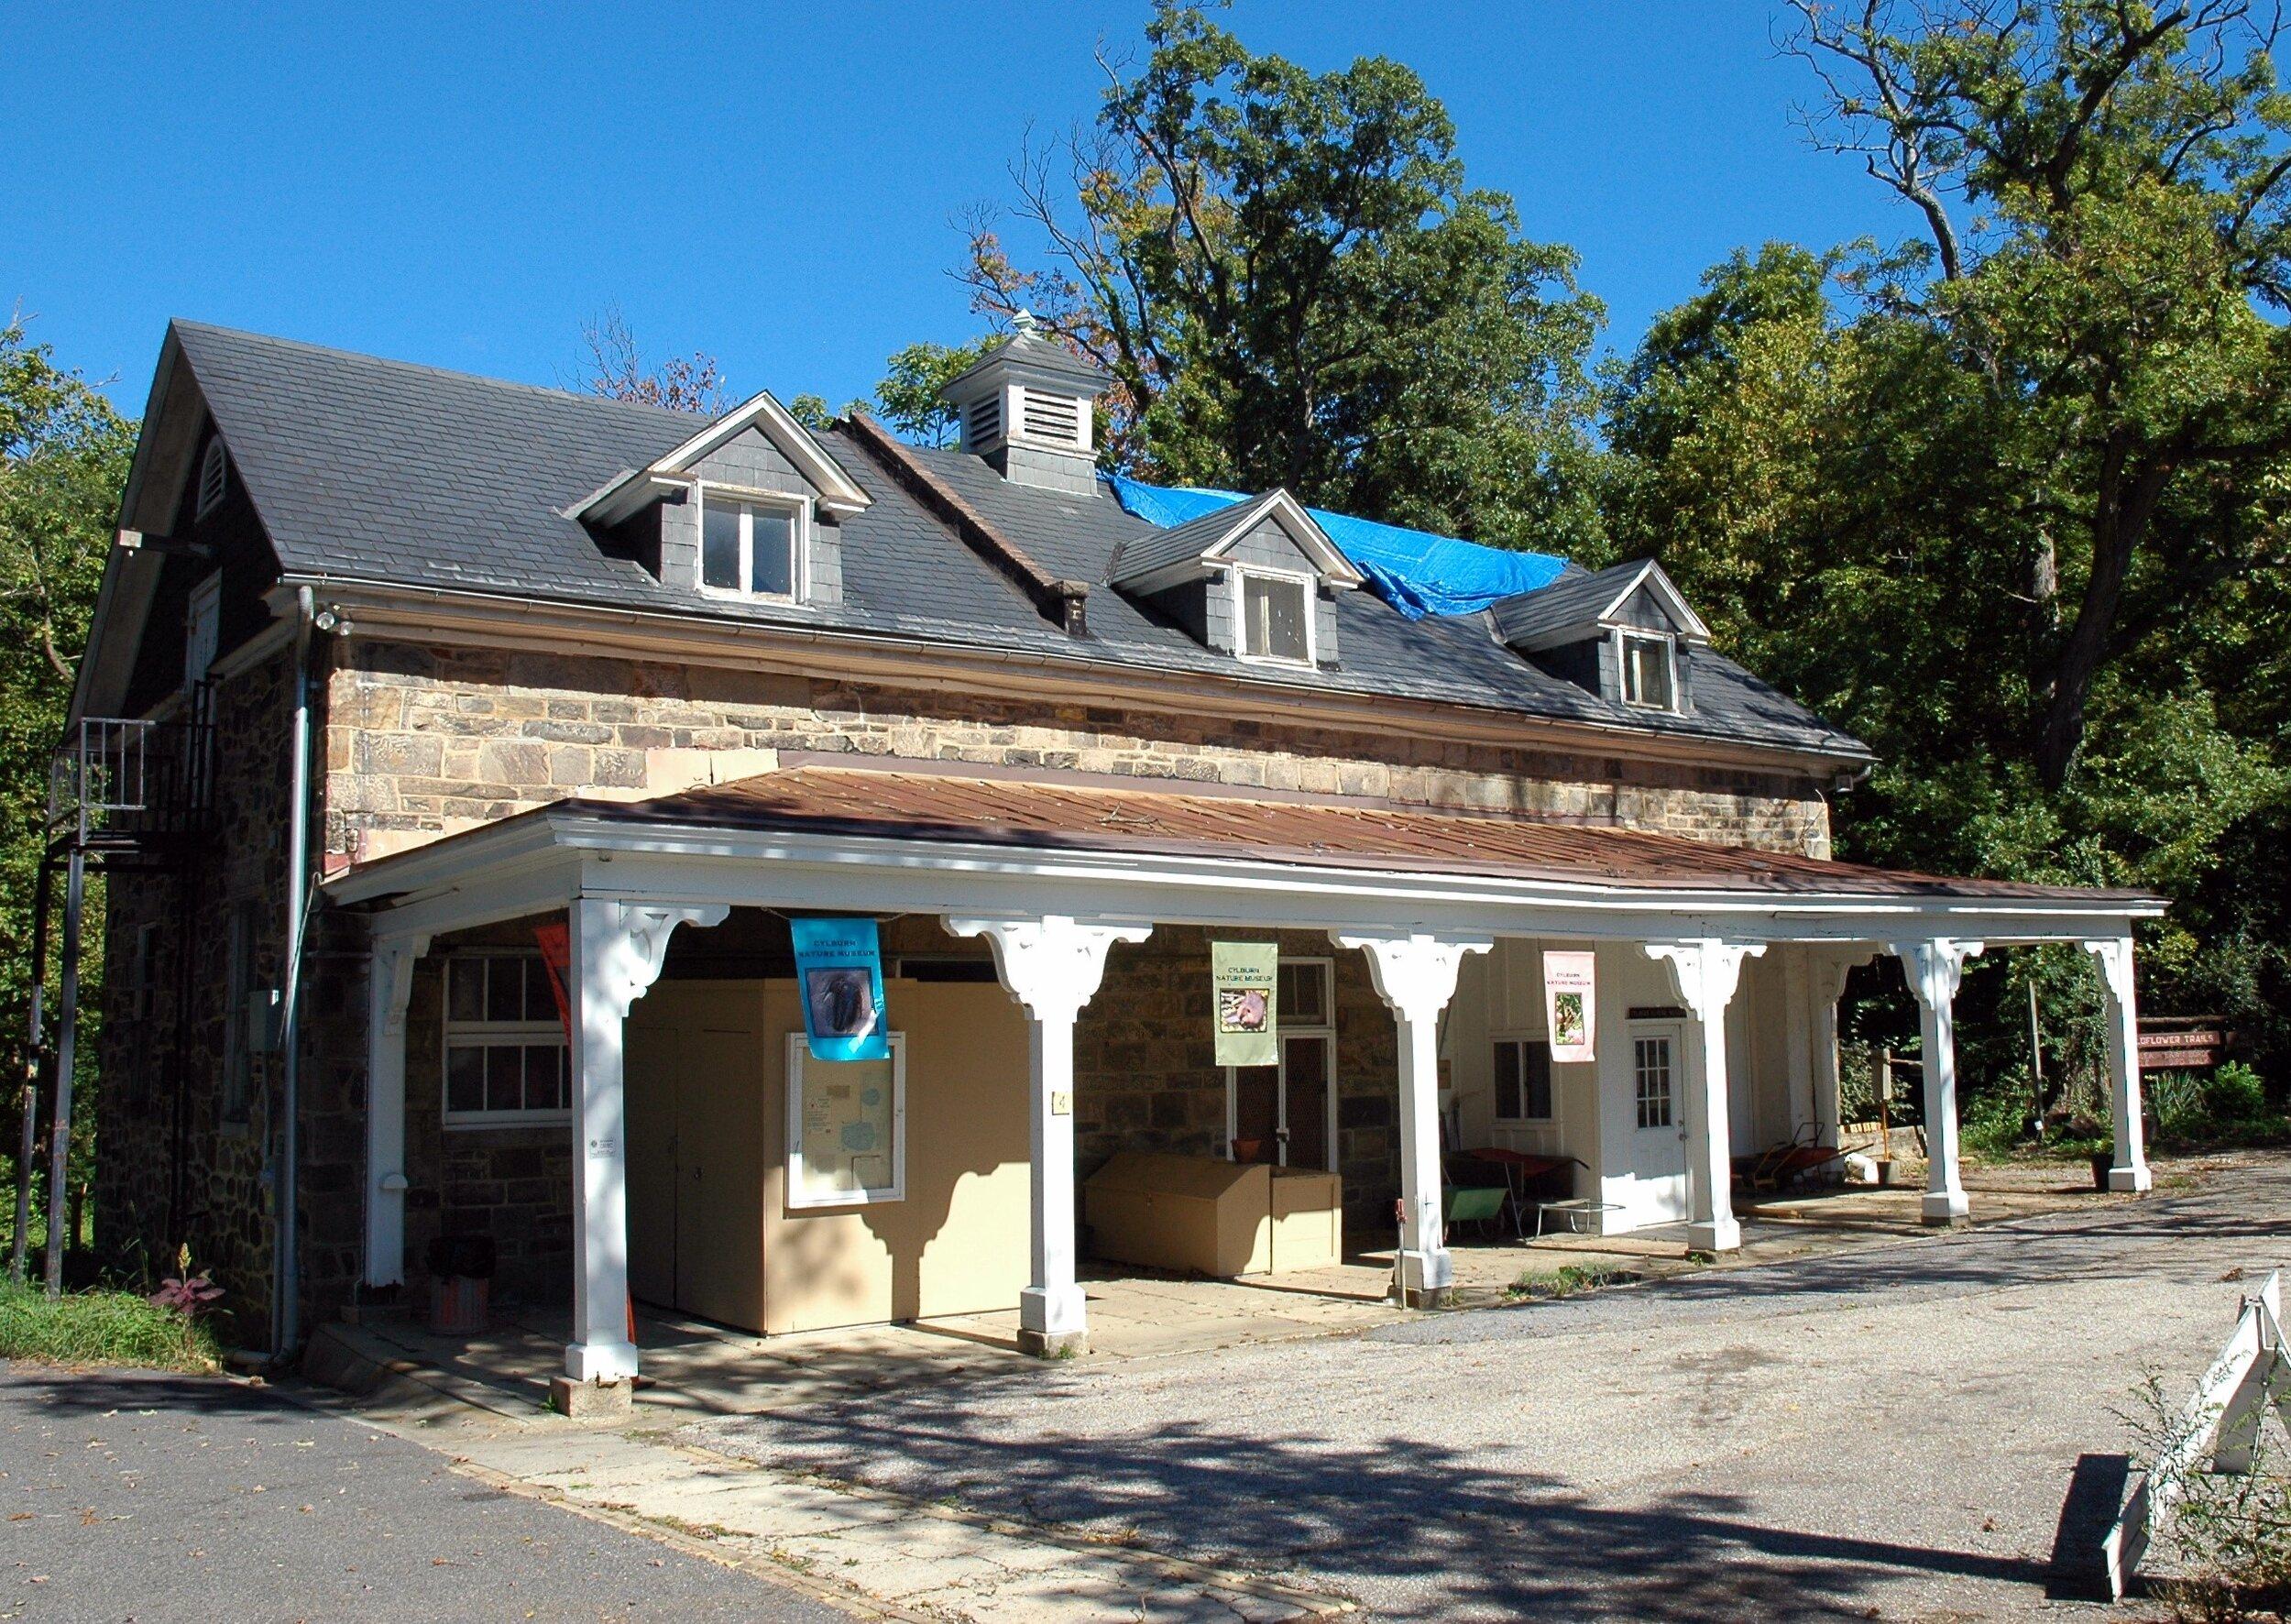 Cylburn Arboretum Carriage House